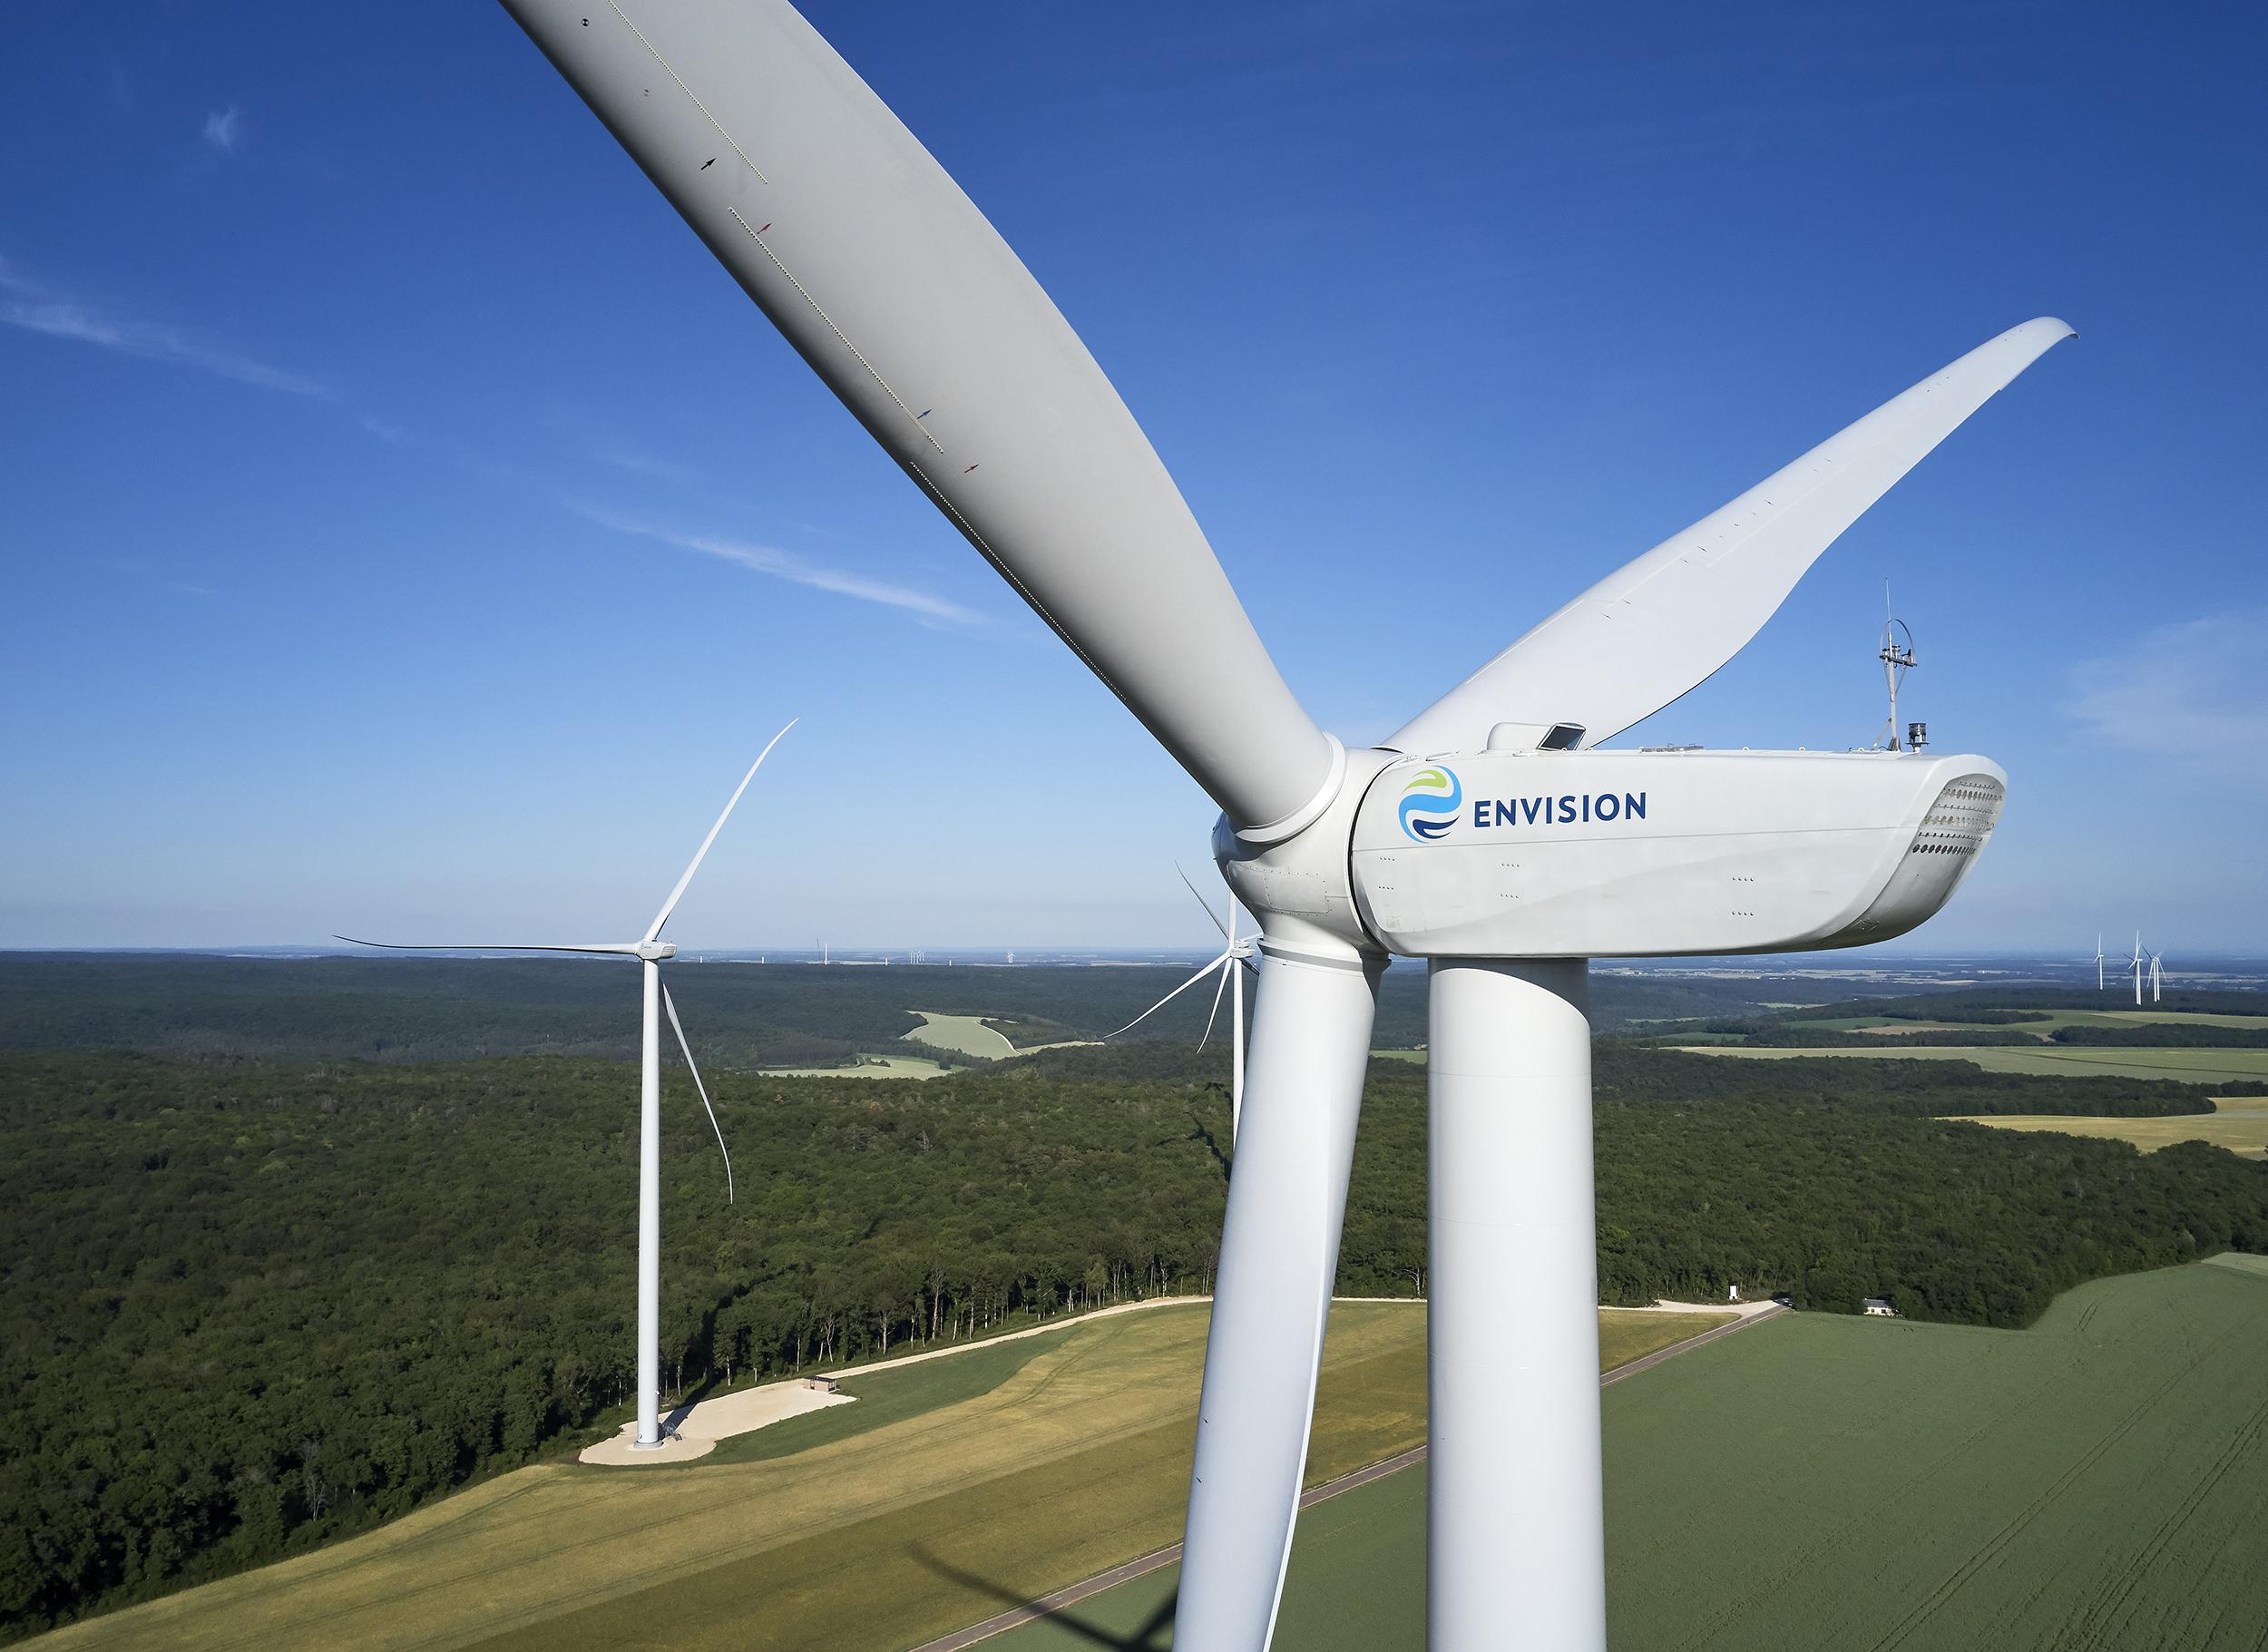 Envision turbines